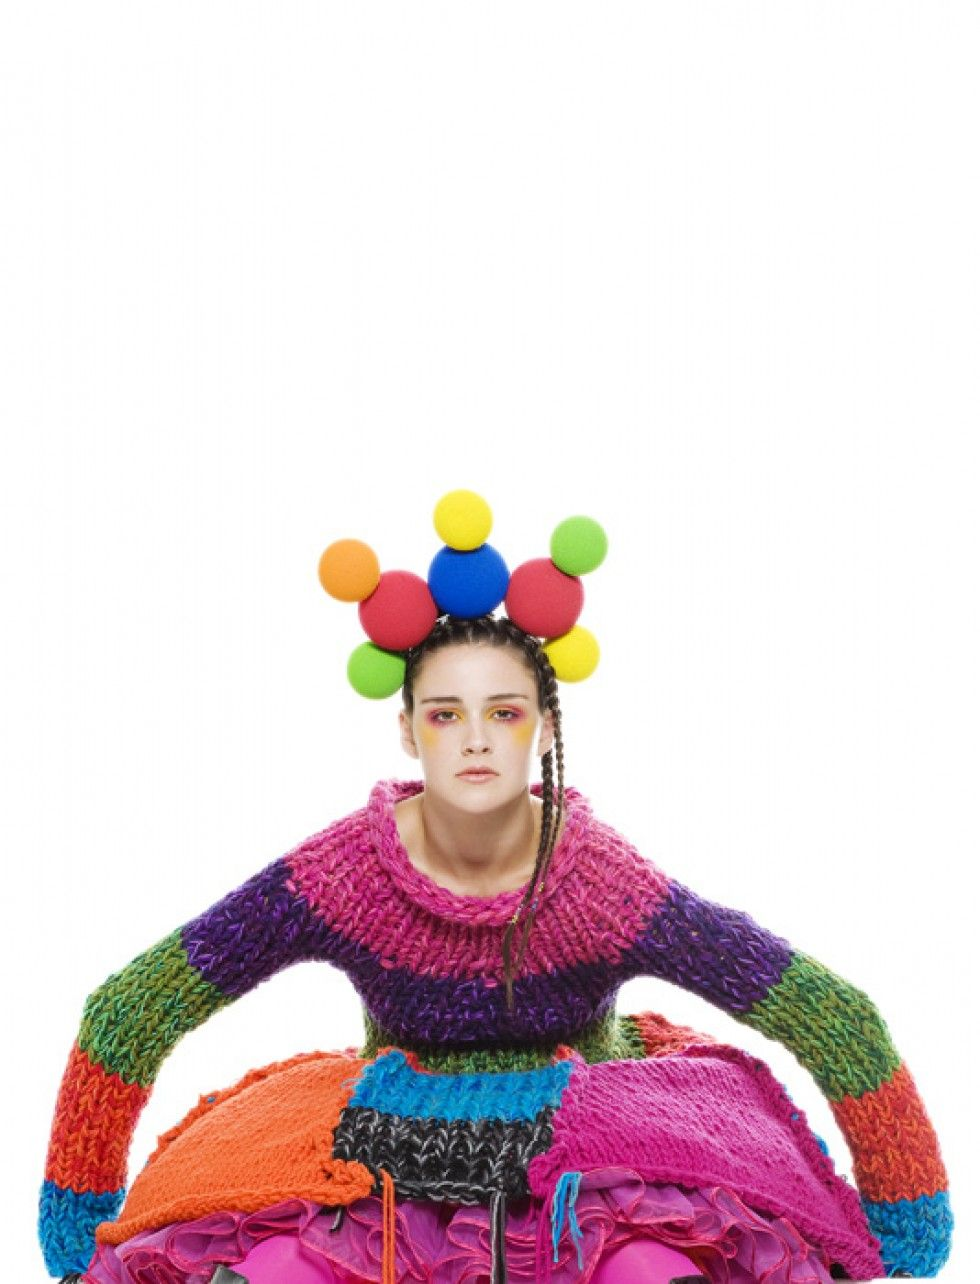 knitGrandeur®: On the Bright Side-Fool Clothing, L'Oreal Paris Runway F/W 2009